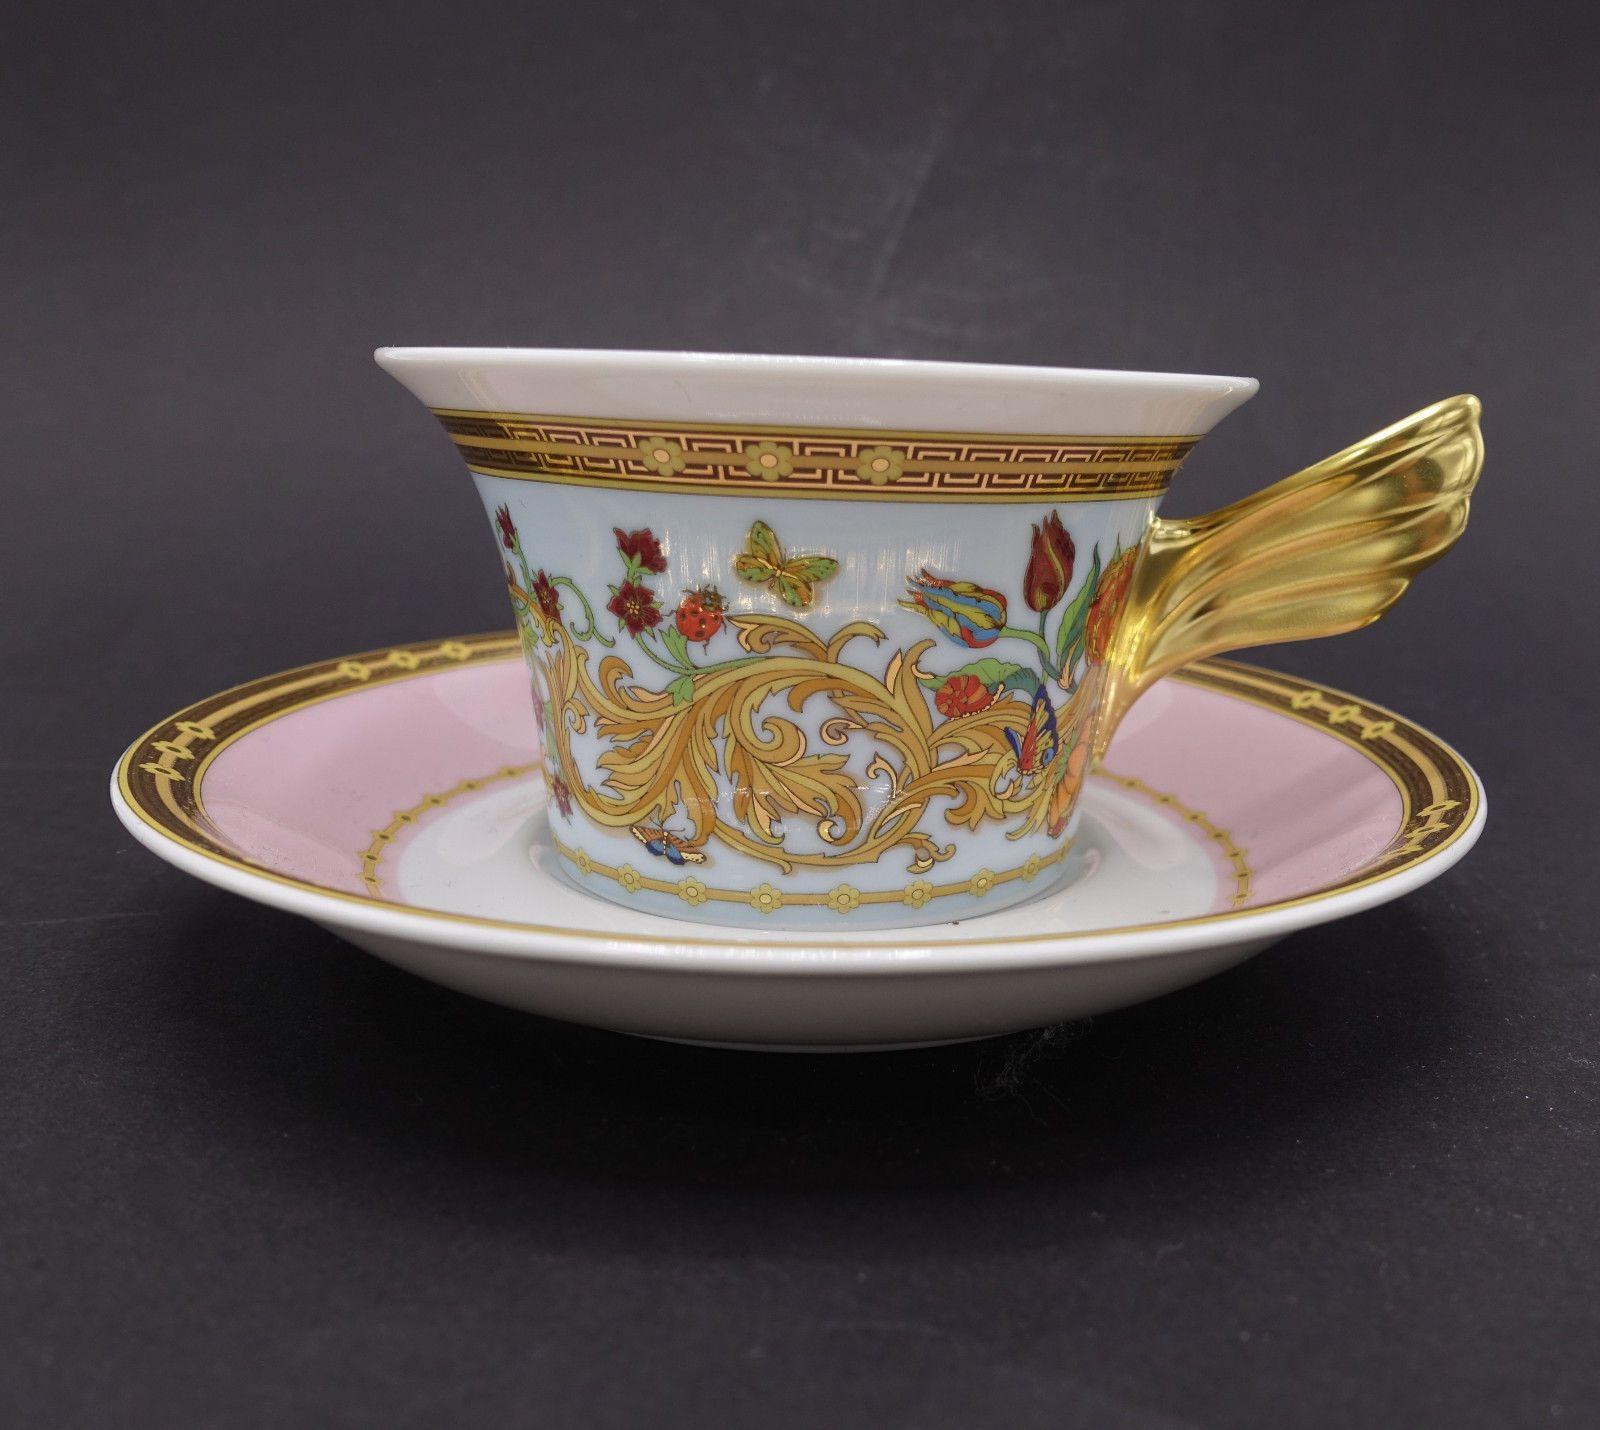 Rosenthal Versace Porzellan Kaffee Tee Kakao Tasse GH 106181 | EBay